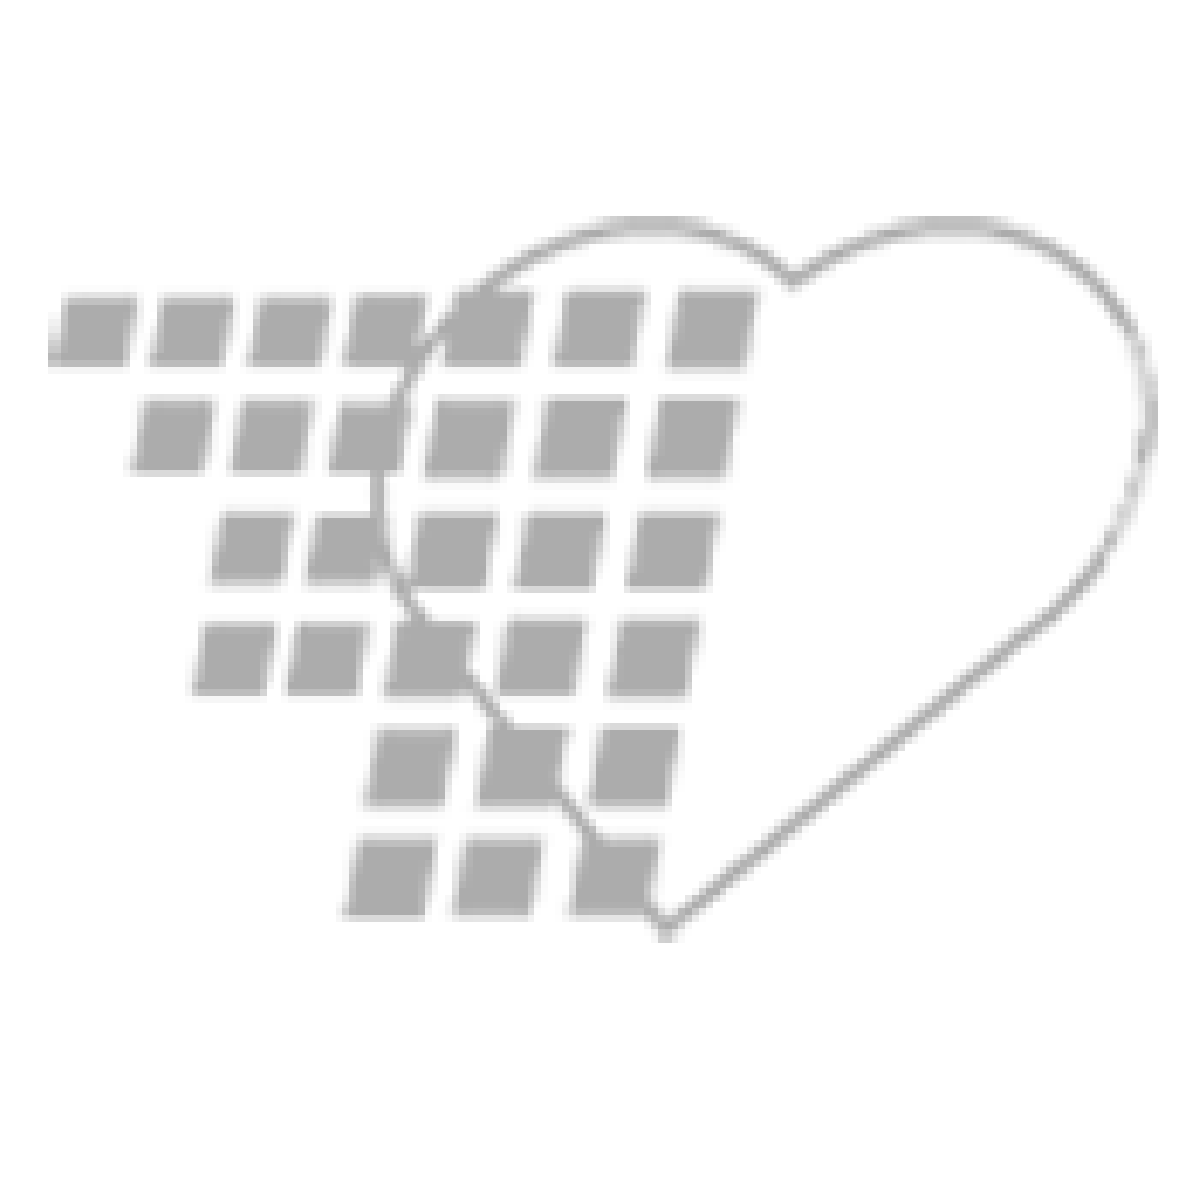 06-93-7526 Demo Dose® Vitamn K Ampule/IV Home Infusion Kit